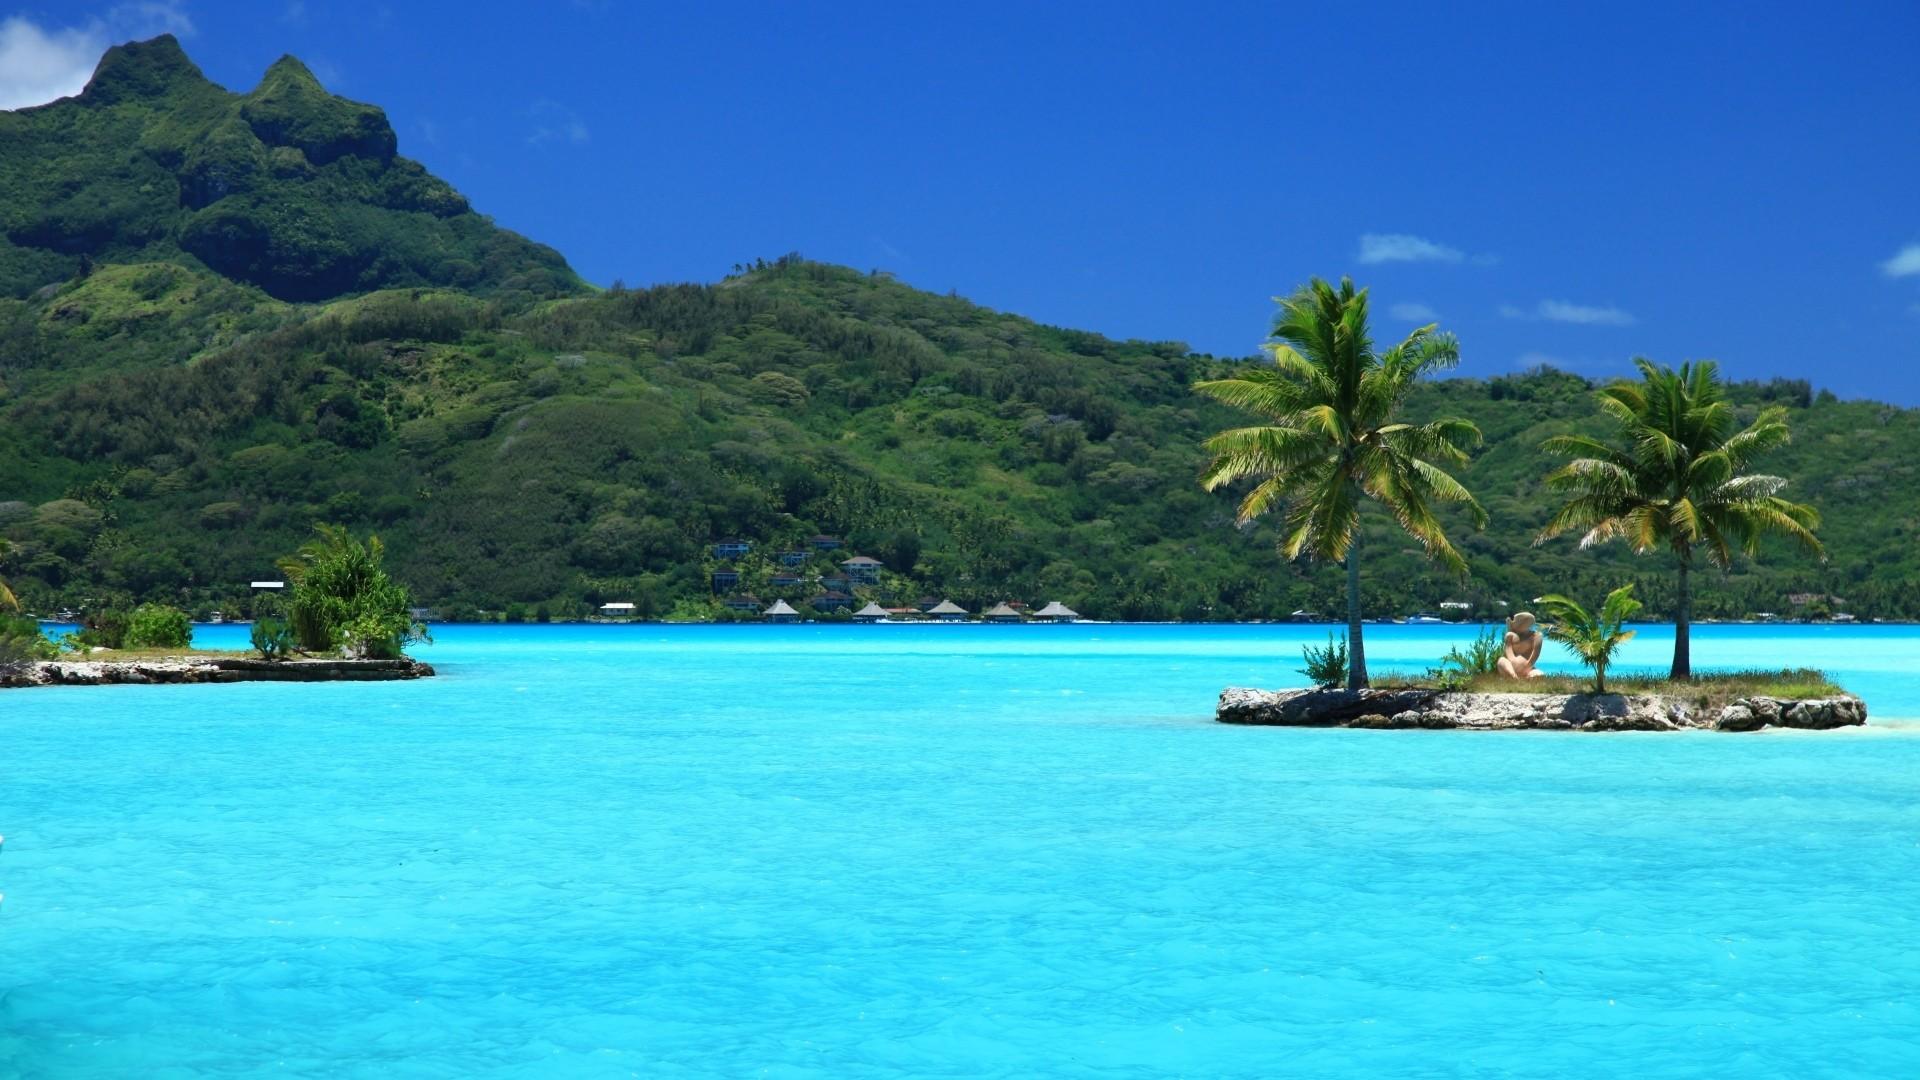 Island Picture